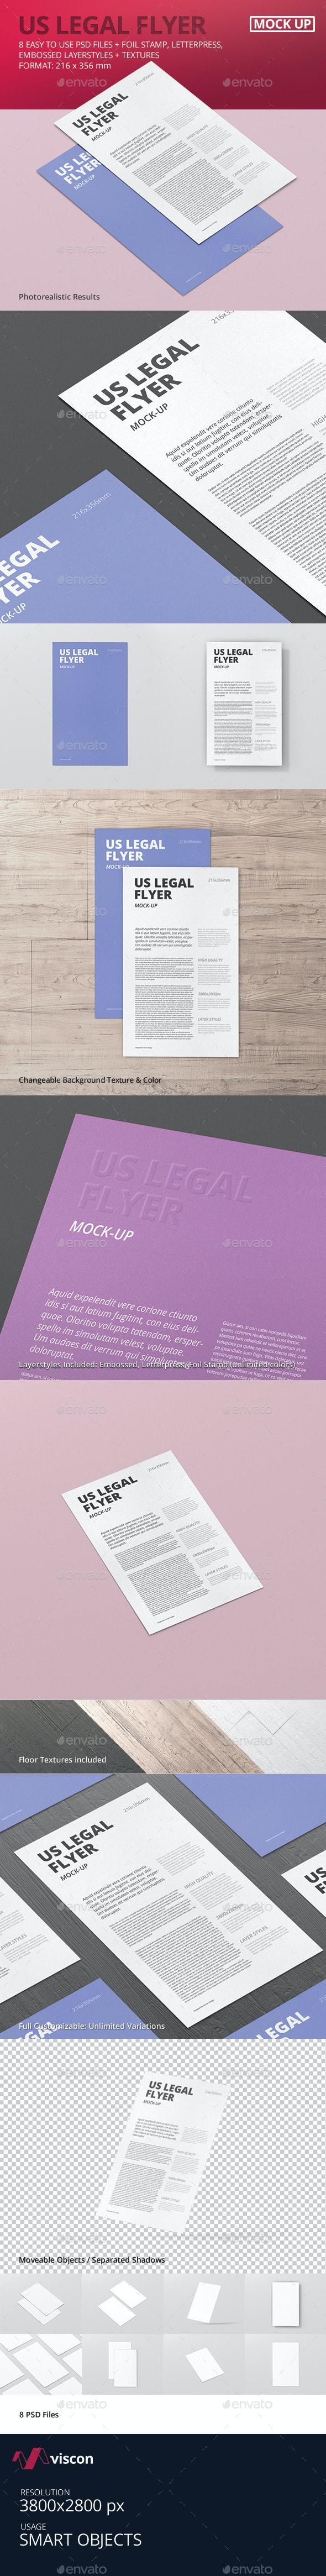 US Legal Flyer Mock-Up - Flyers Print